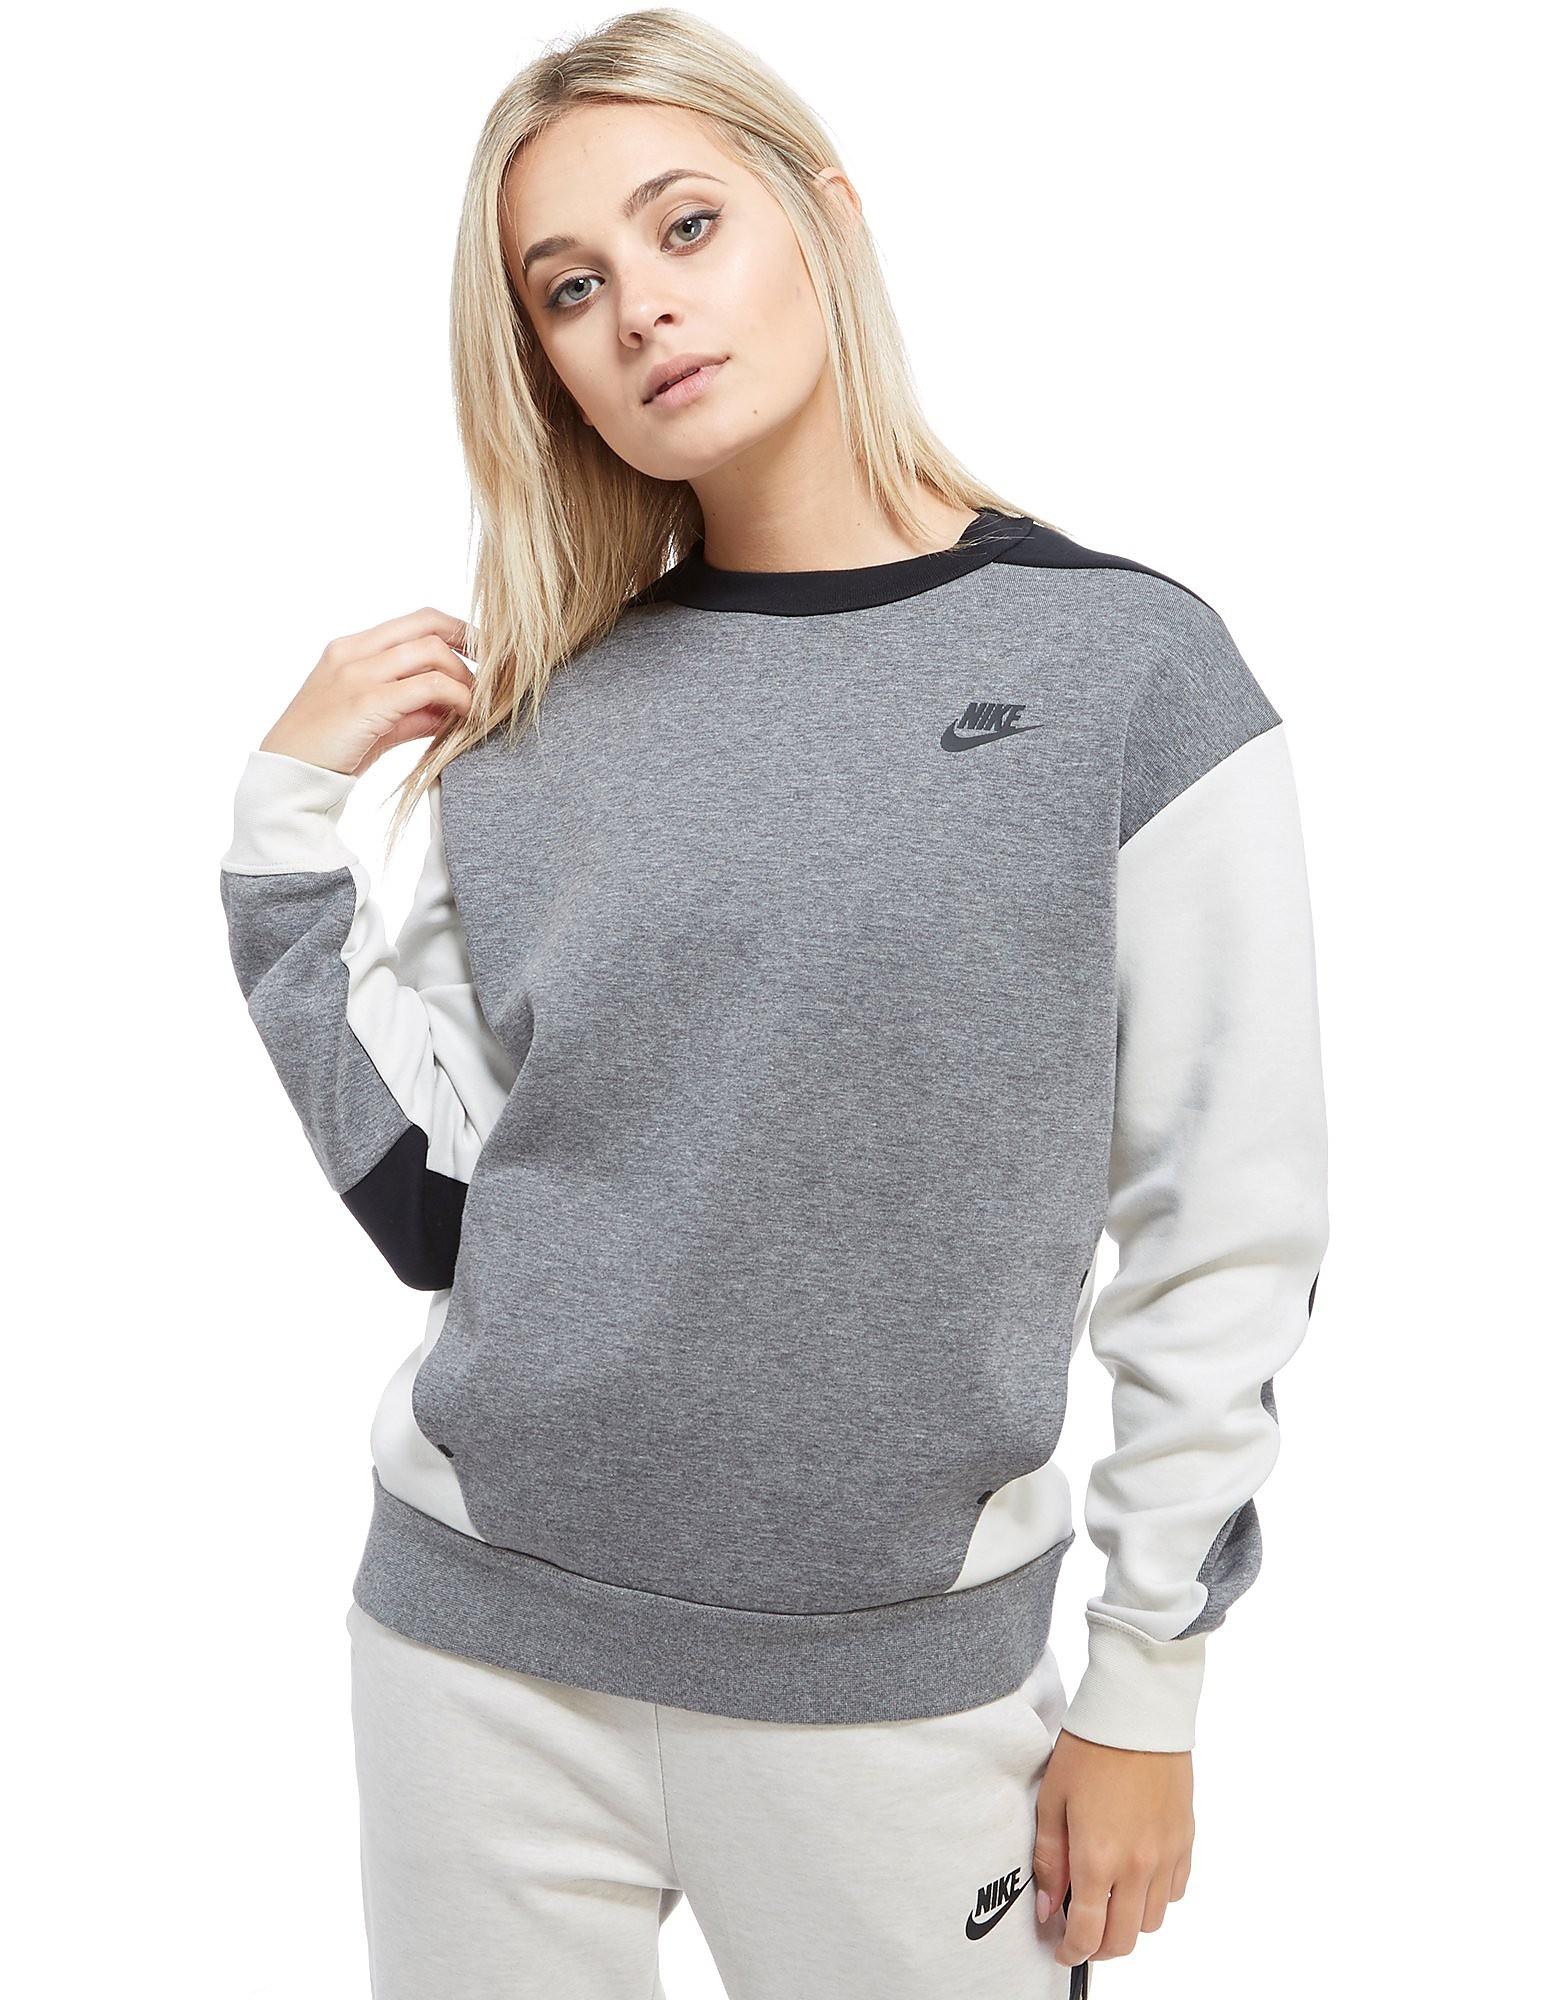 Nike Tech Fleece Colourblock Crew Sweatshirt